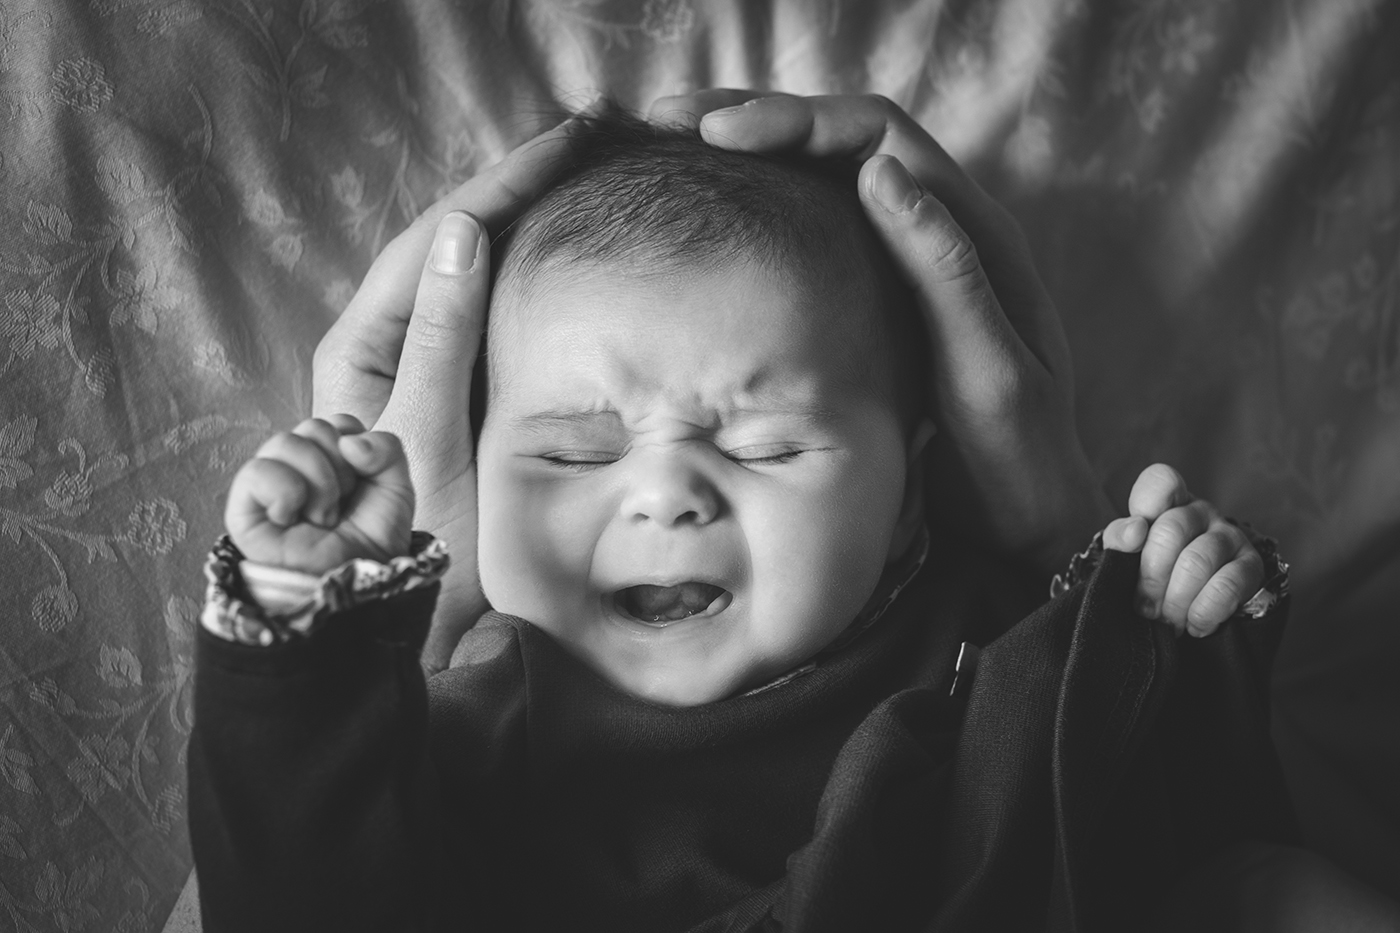 photographe-naissance-maternite-enfant-bebe-poitiers-guillaume-heraud-06